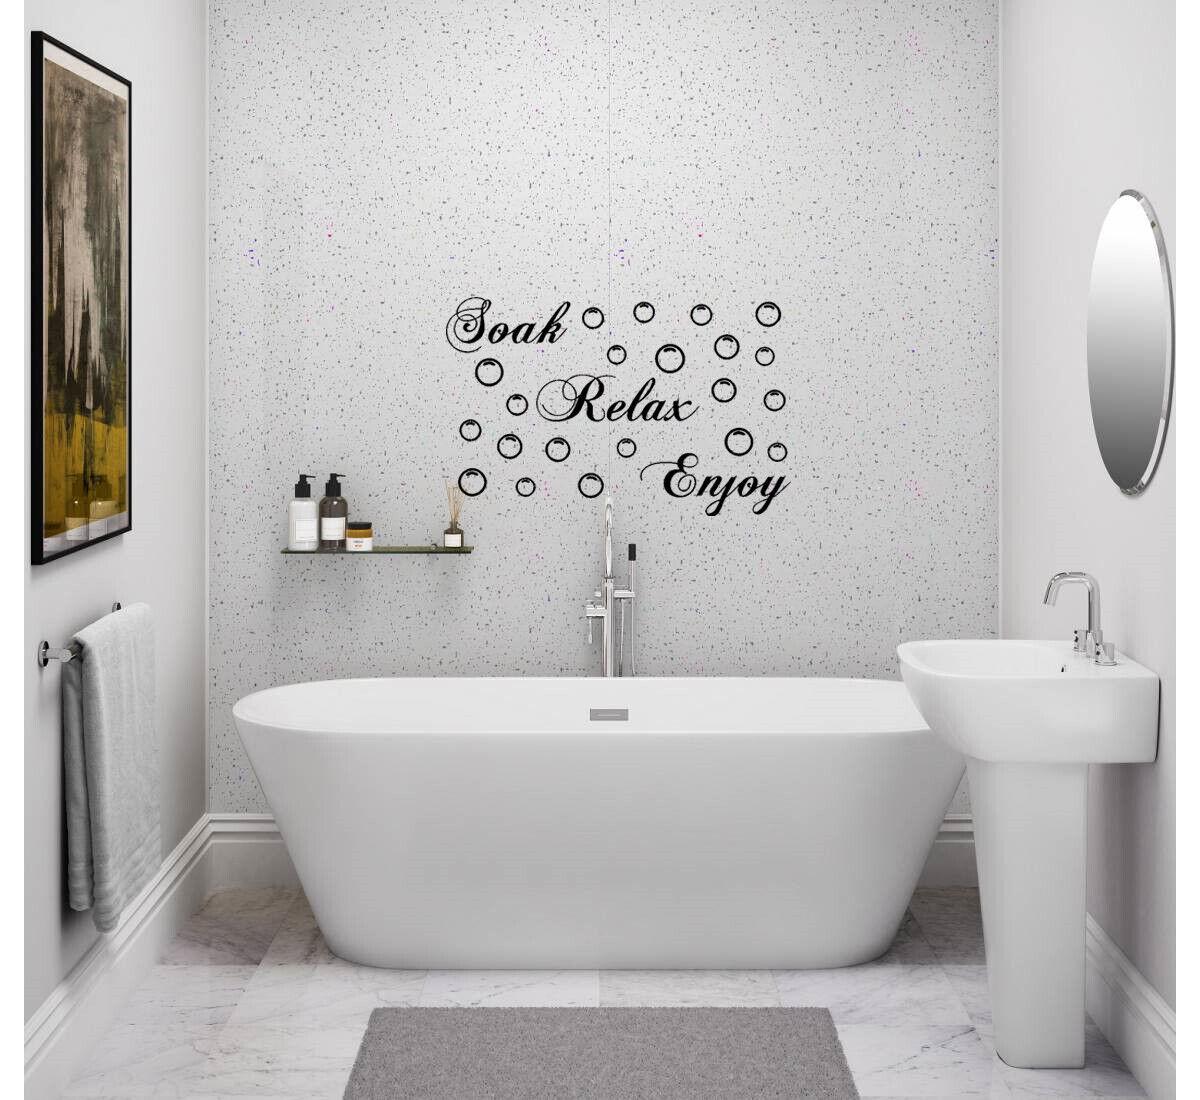 Home Decoration - BATHROOM Sticker Decal Soak Relax Enjoy Quote Wall Art DIY